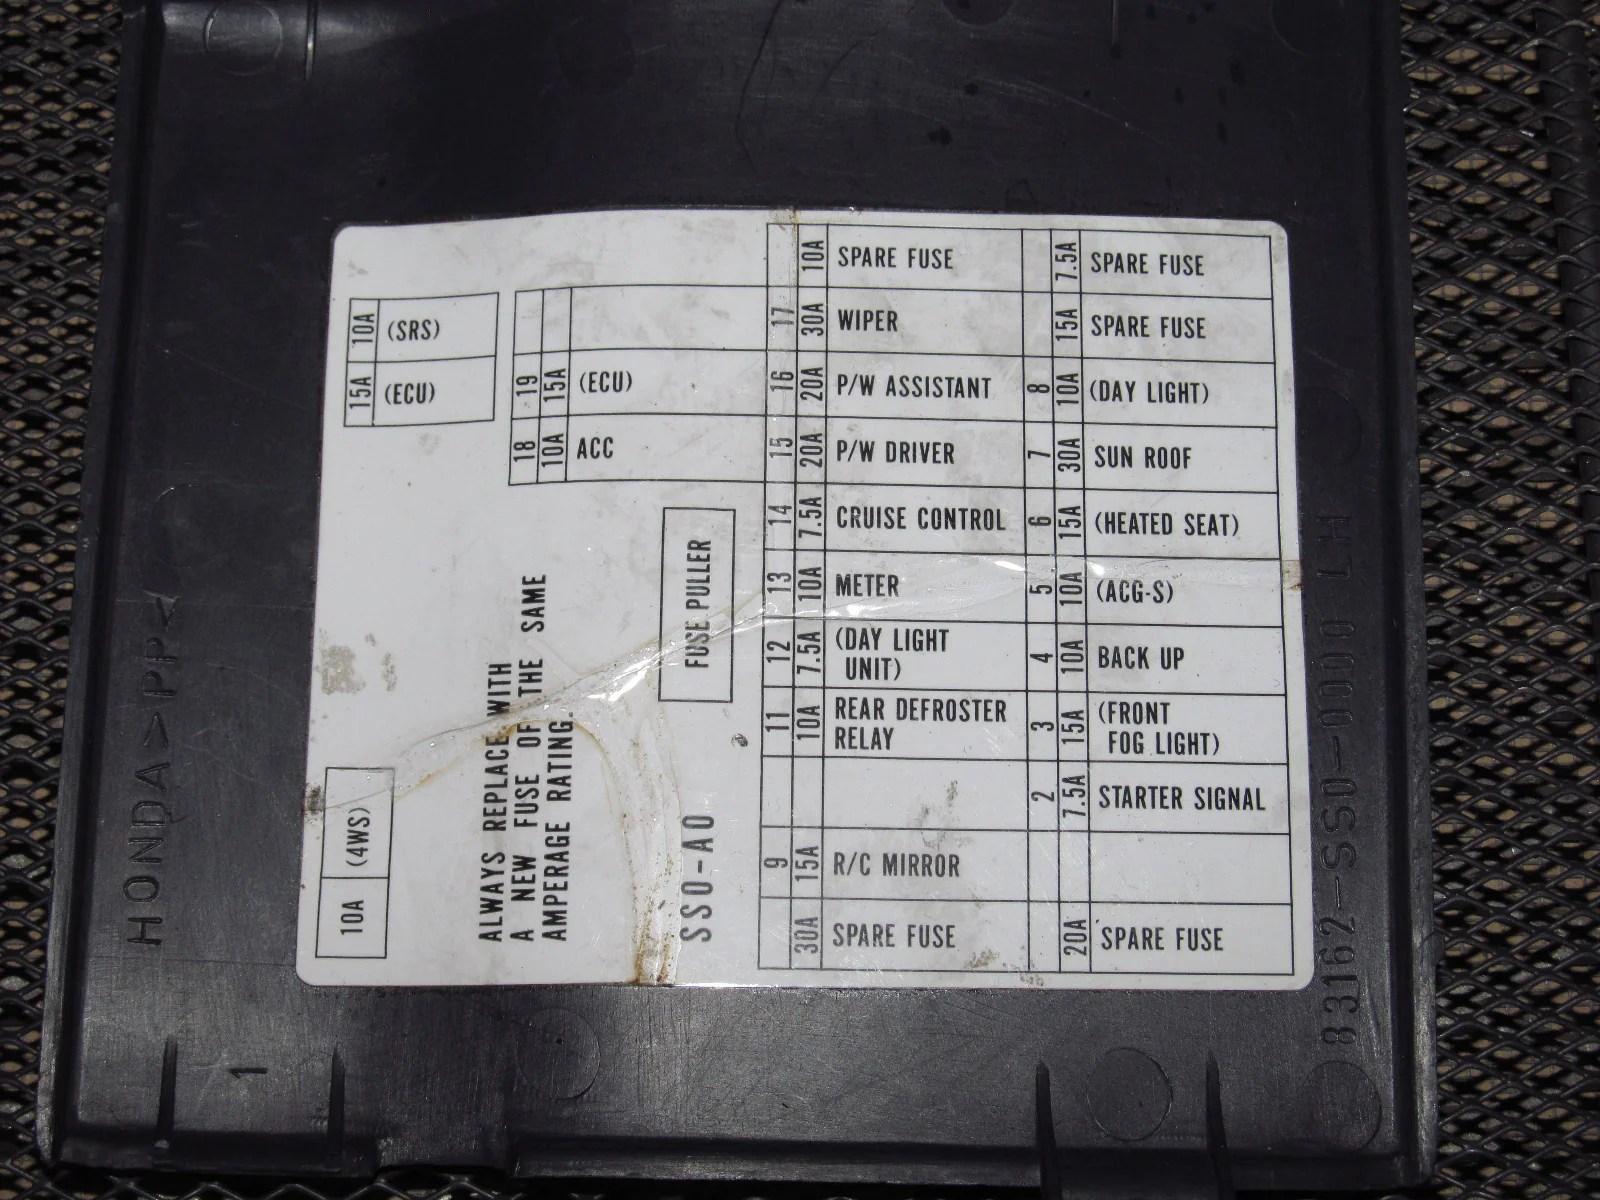 medium resolution of 92 96 prelude fuse box wiring diagram centre mix 92 93 94 95 96 honda prelude